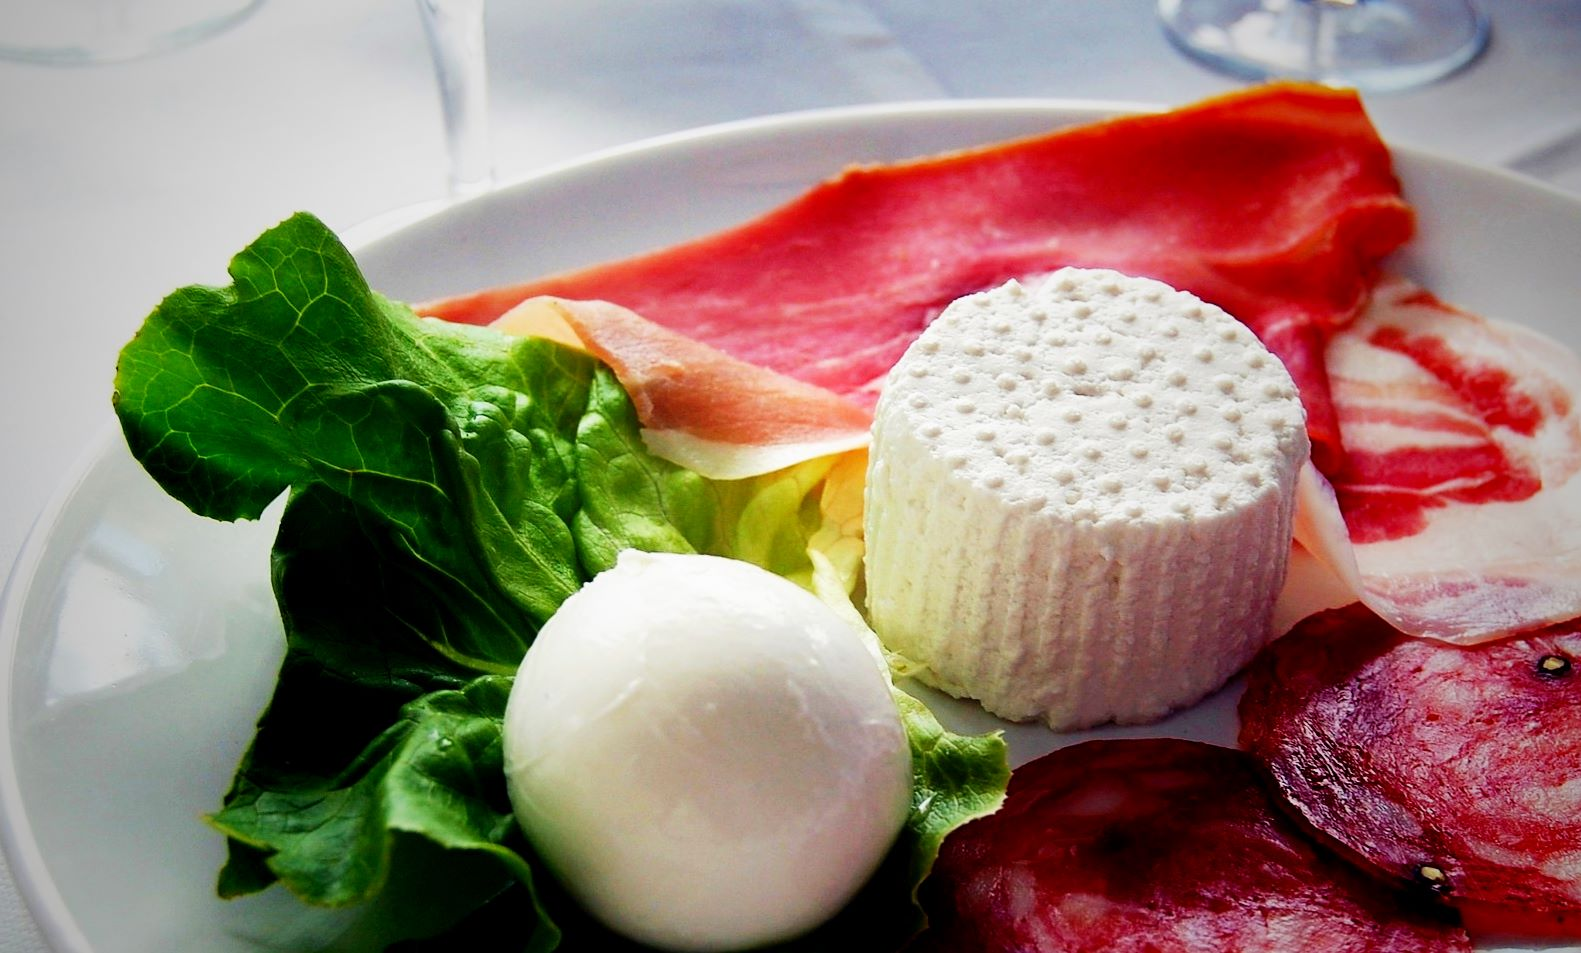 apulia-slow-travel-welcome dinner-cena di benvenuto-salame-burrata-ricotta-insalata-prosciutto crudo-dieta mediterranea-mediterranische diaet-mediterranean diet